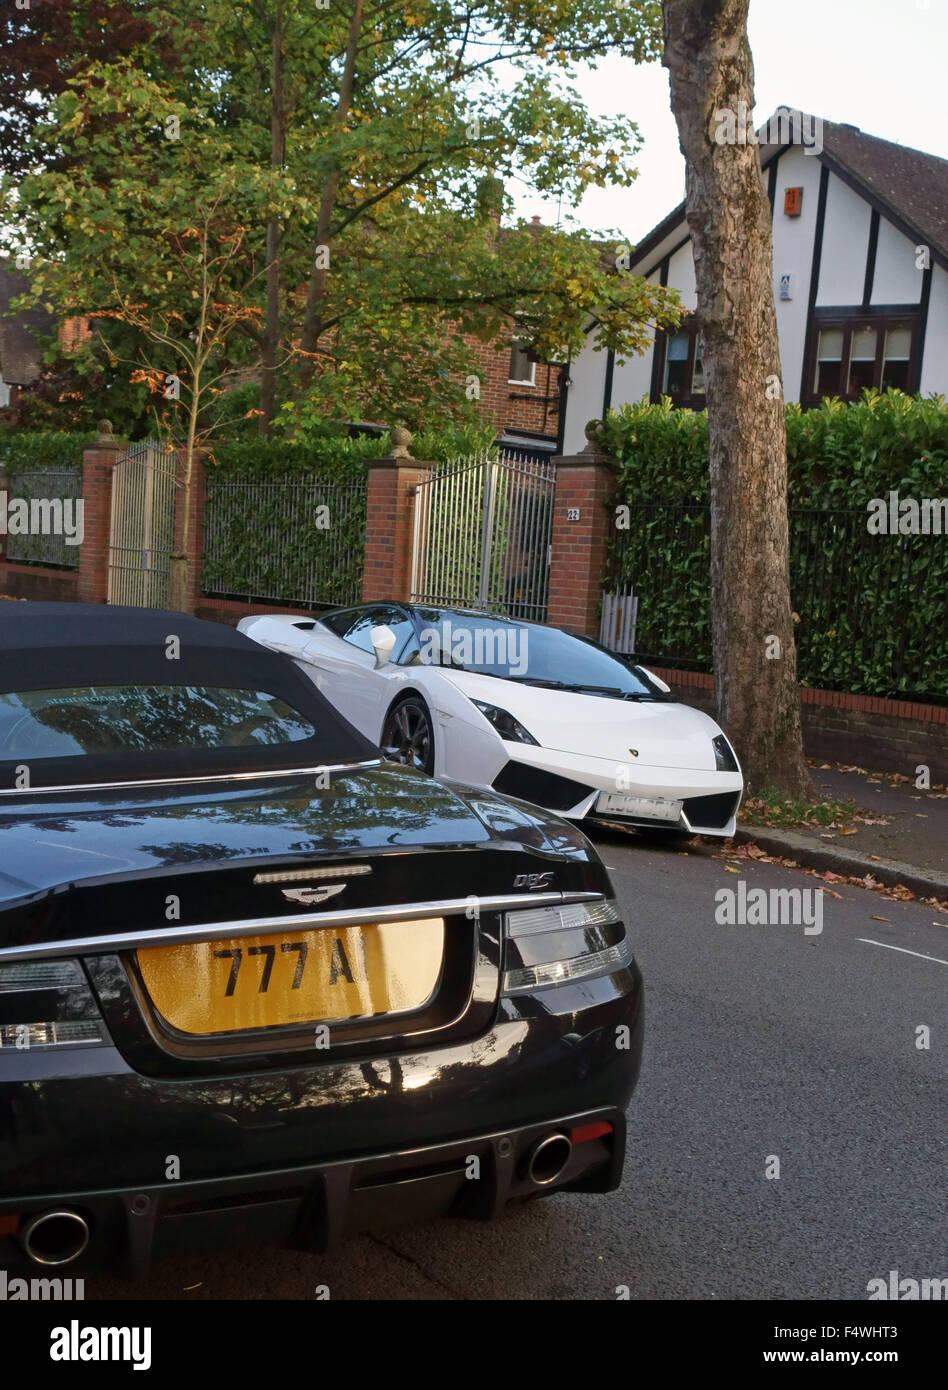 Luxury cars parked in street in wealthy North London neighbourhood - Stock Image